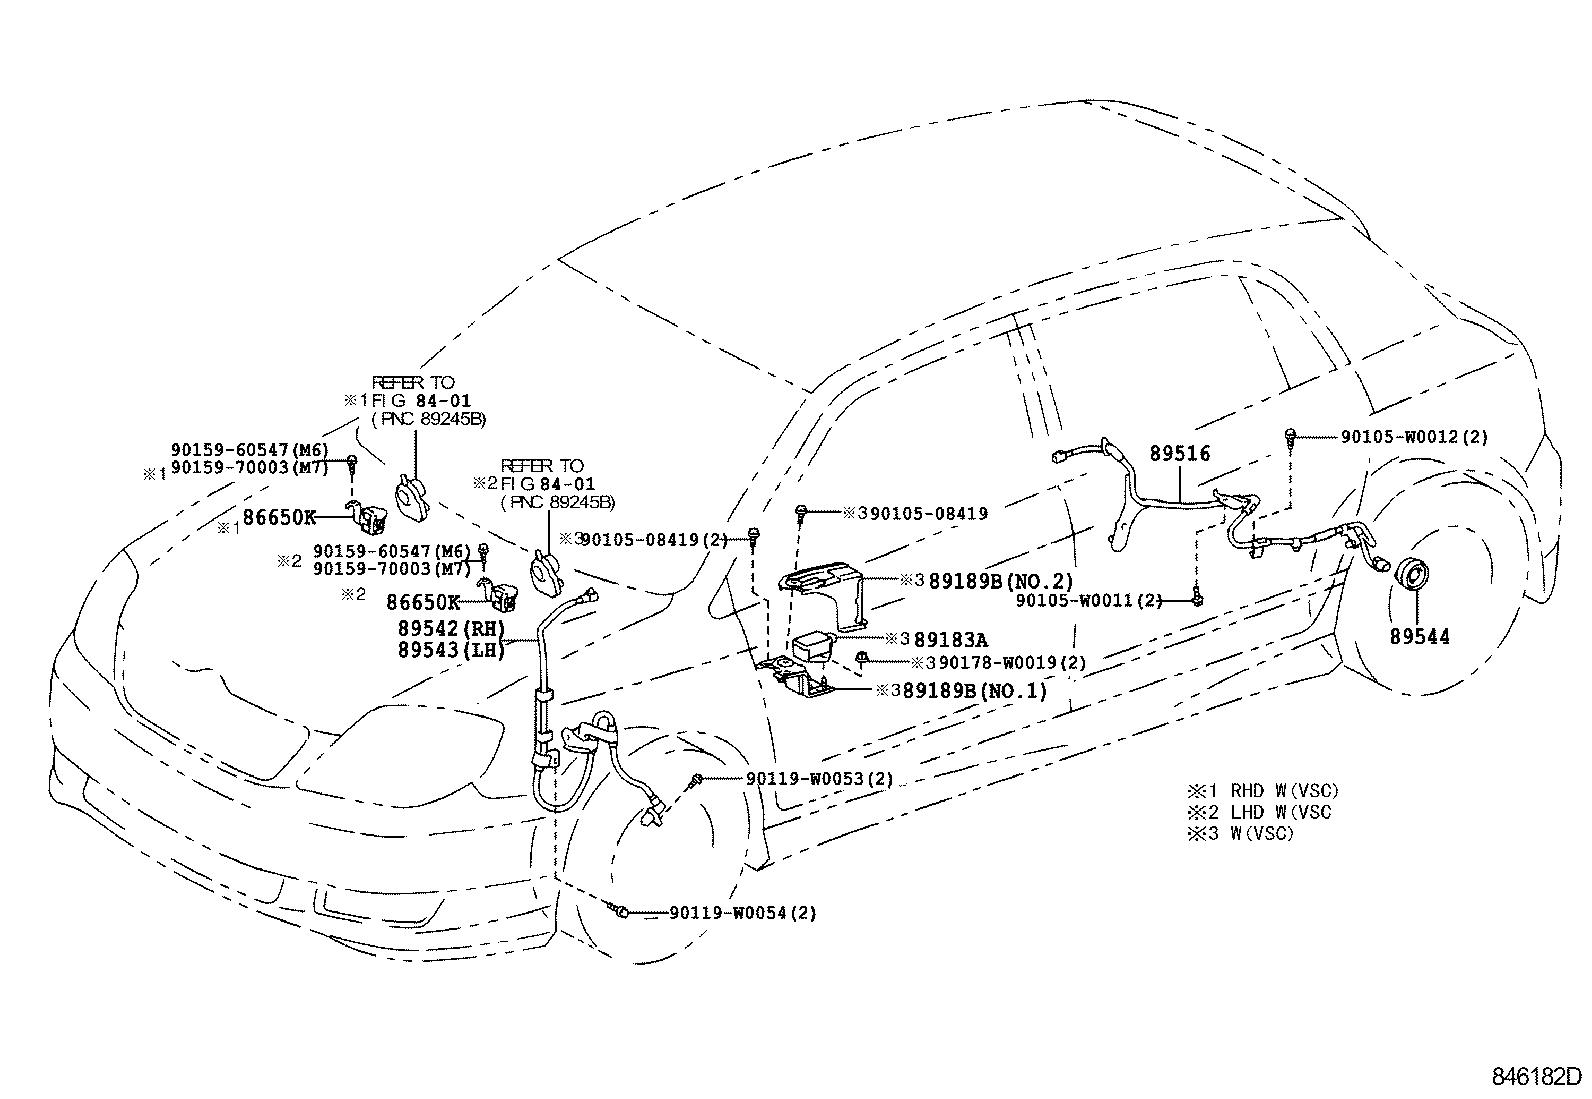 toyota corolla hb ukpcde120l-dhmnxw - electrical